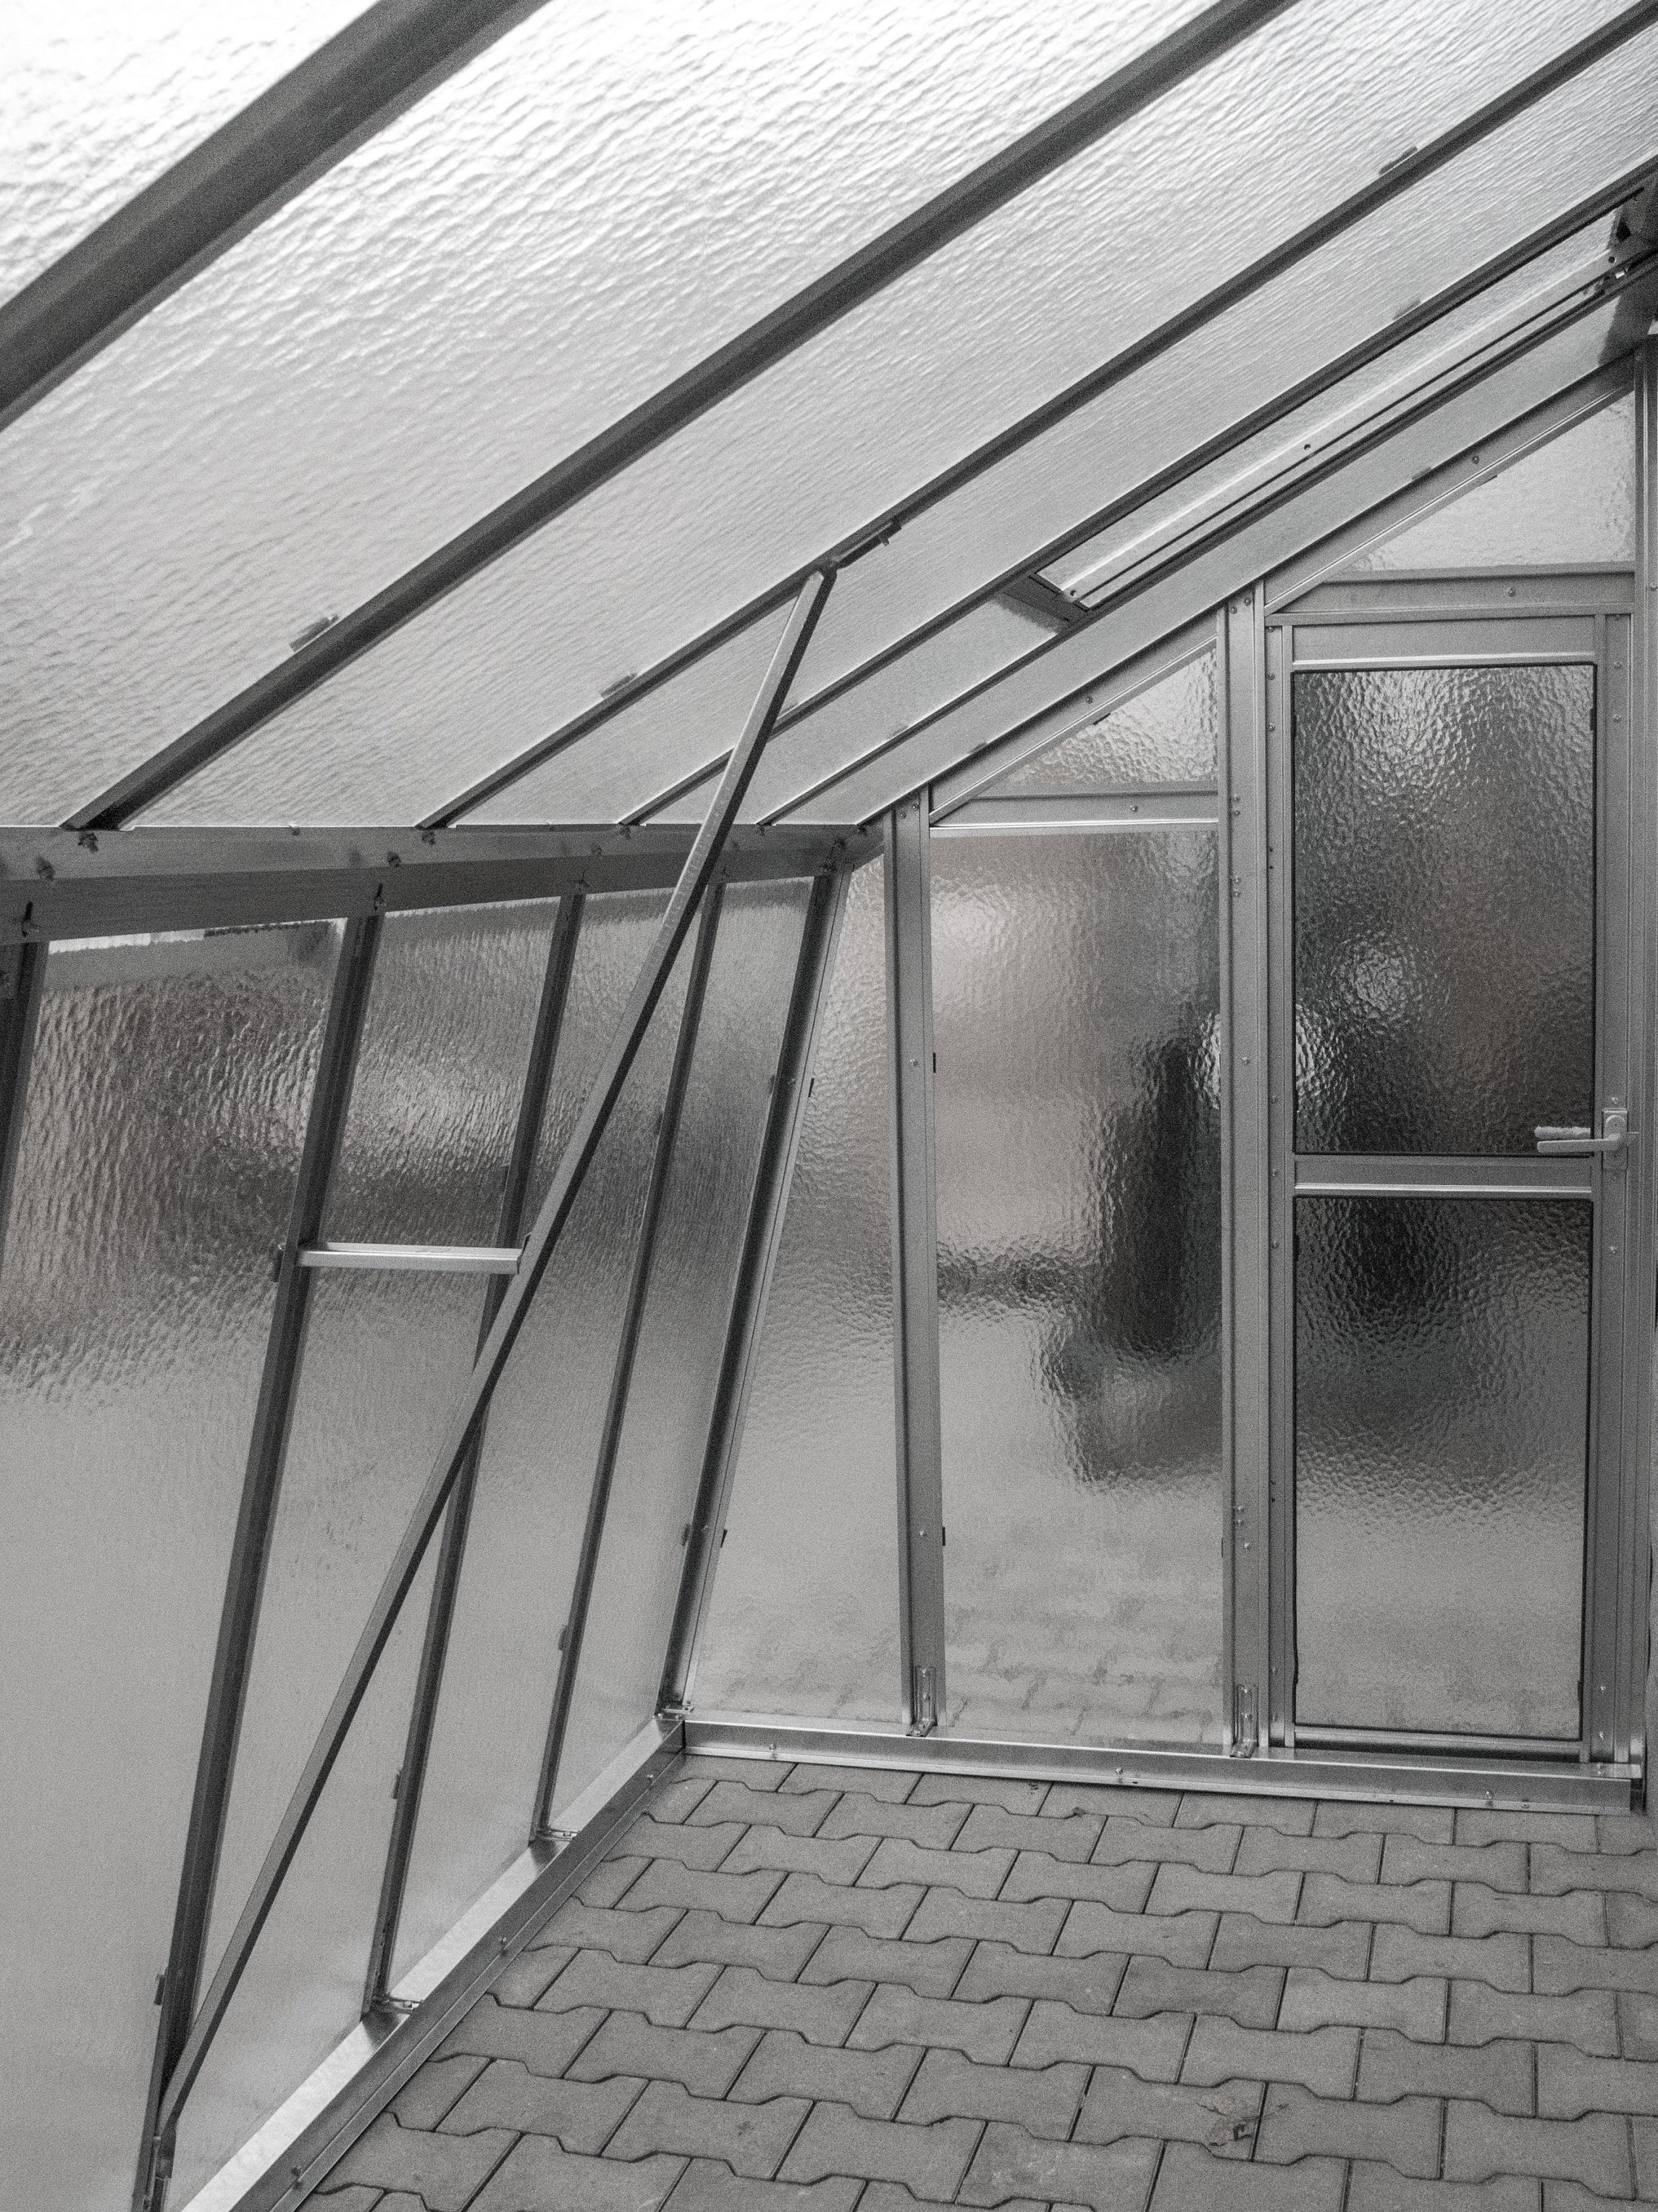 Gartenshop Hartmann Vario Stahl Anlehngewächshaus Casa 6 Bxt